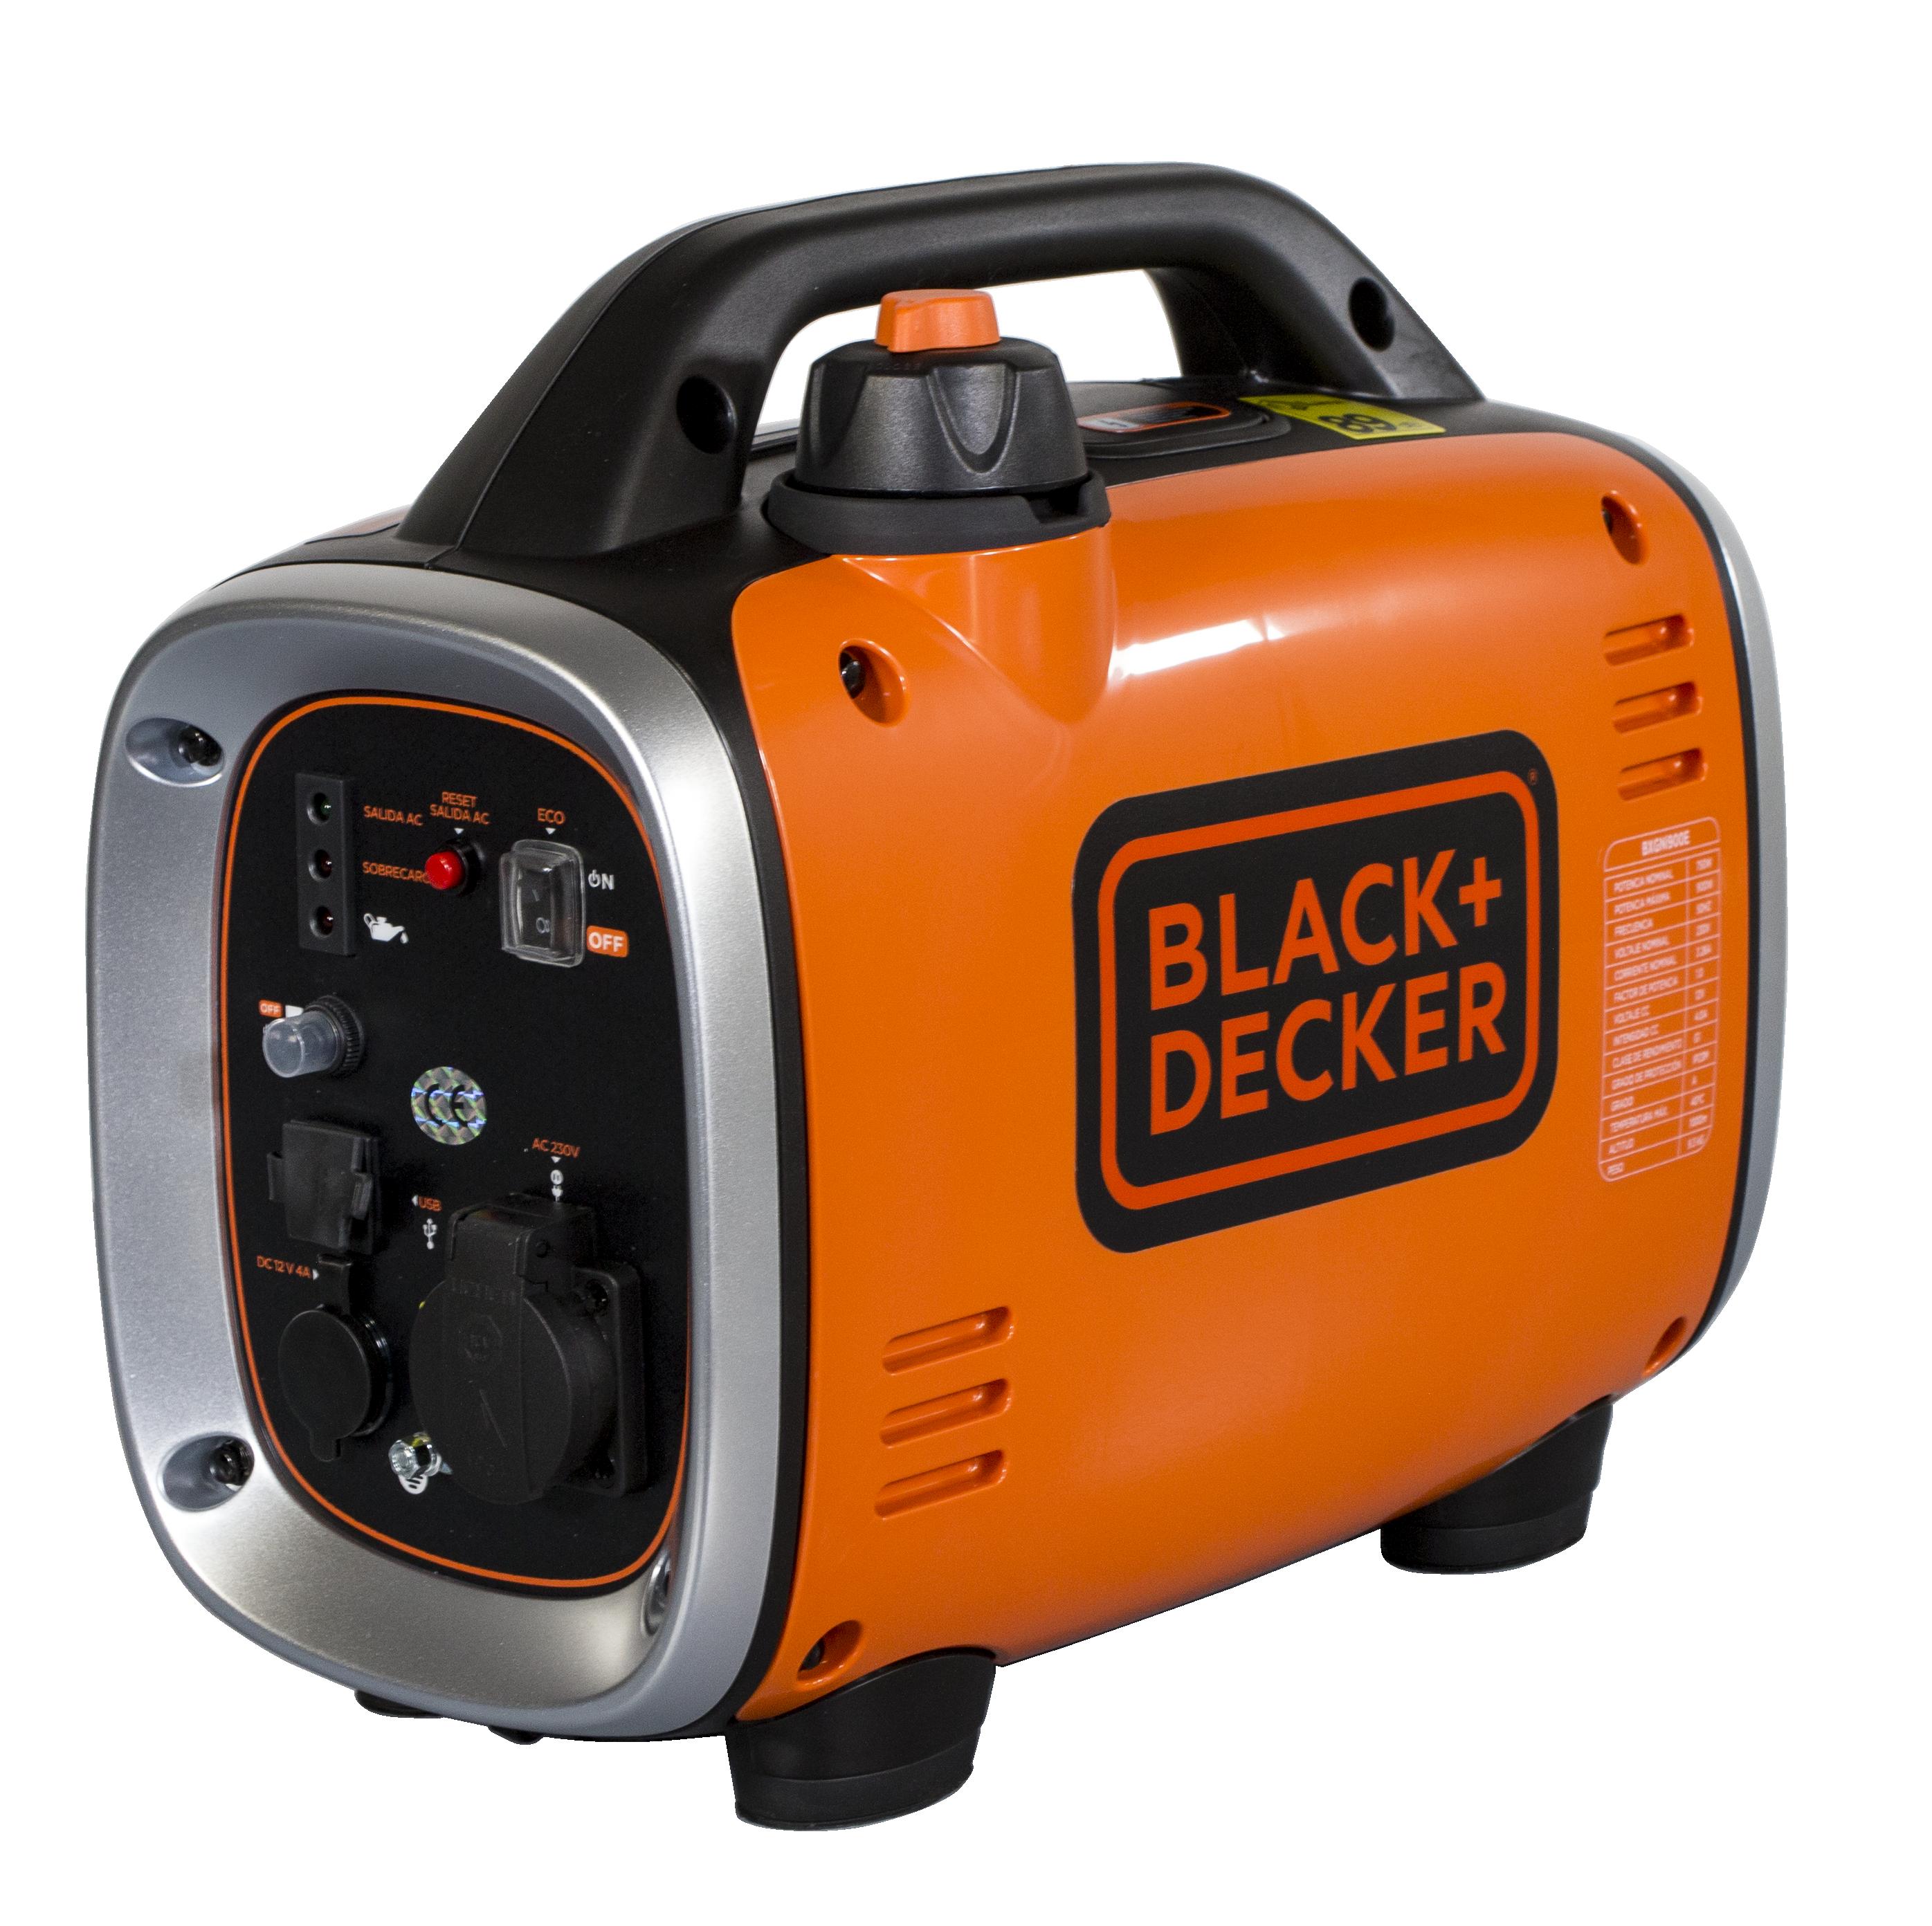 Black + Decker  Inverter 900 Watt Benzin BXGNi900E Stromaggregat